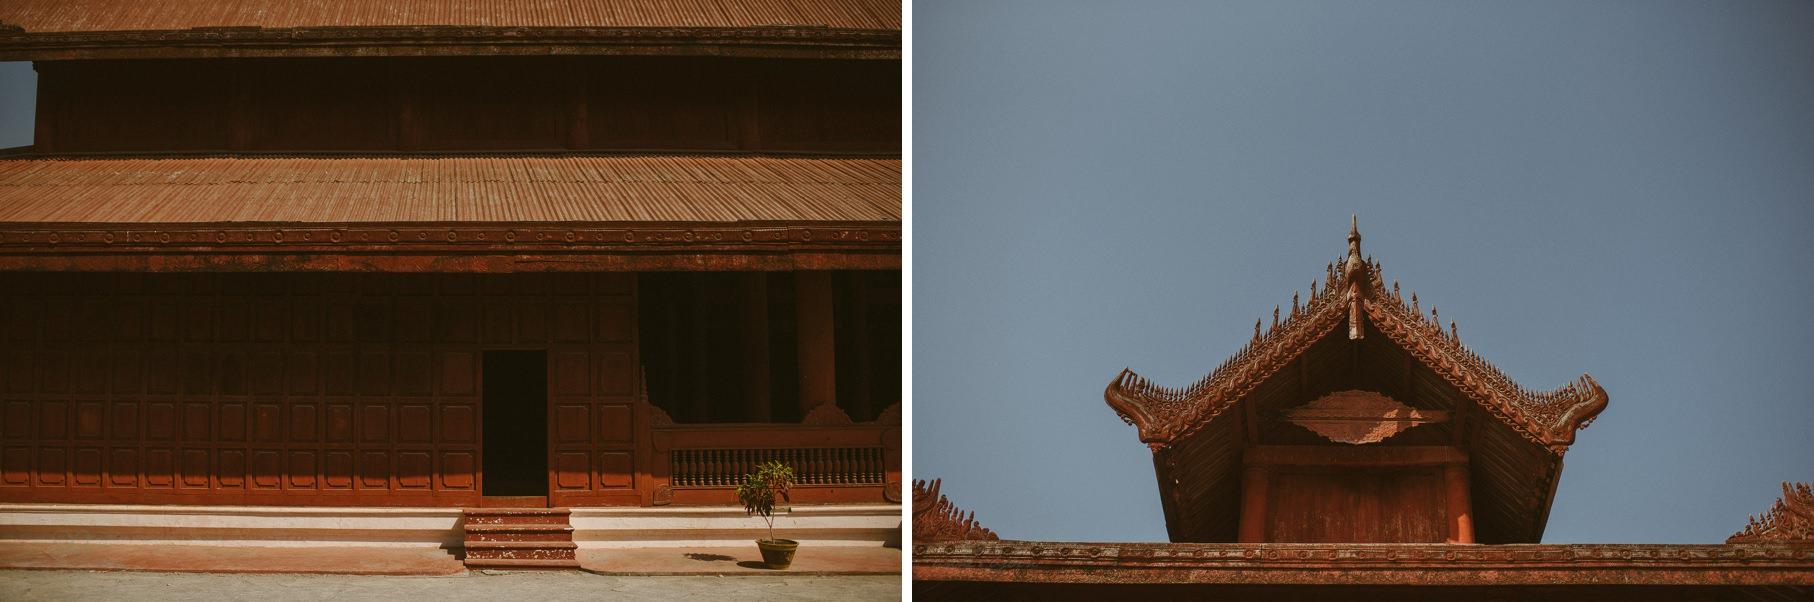 0041 yangon mandalay d76 6604 - Großstädte Myanmars - Yangon & Mandalay